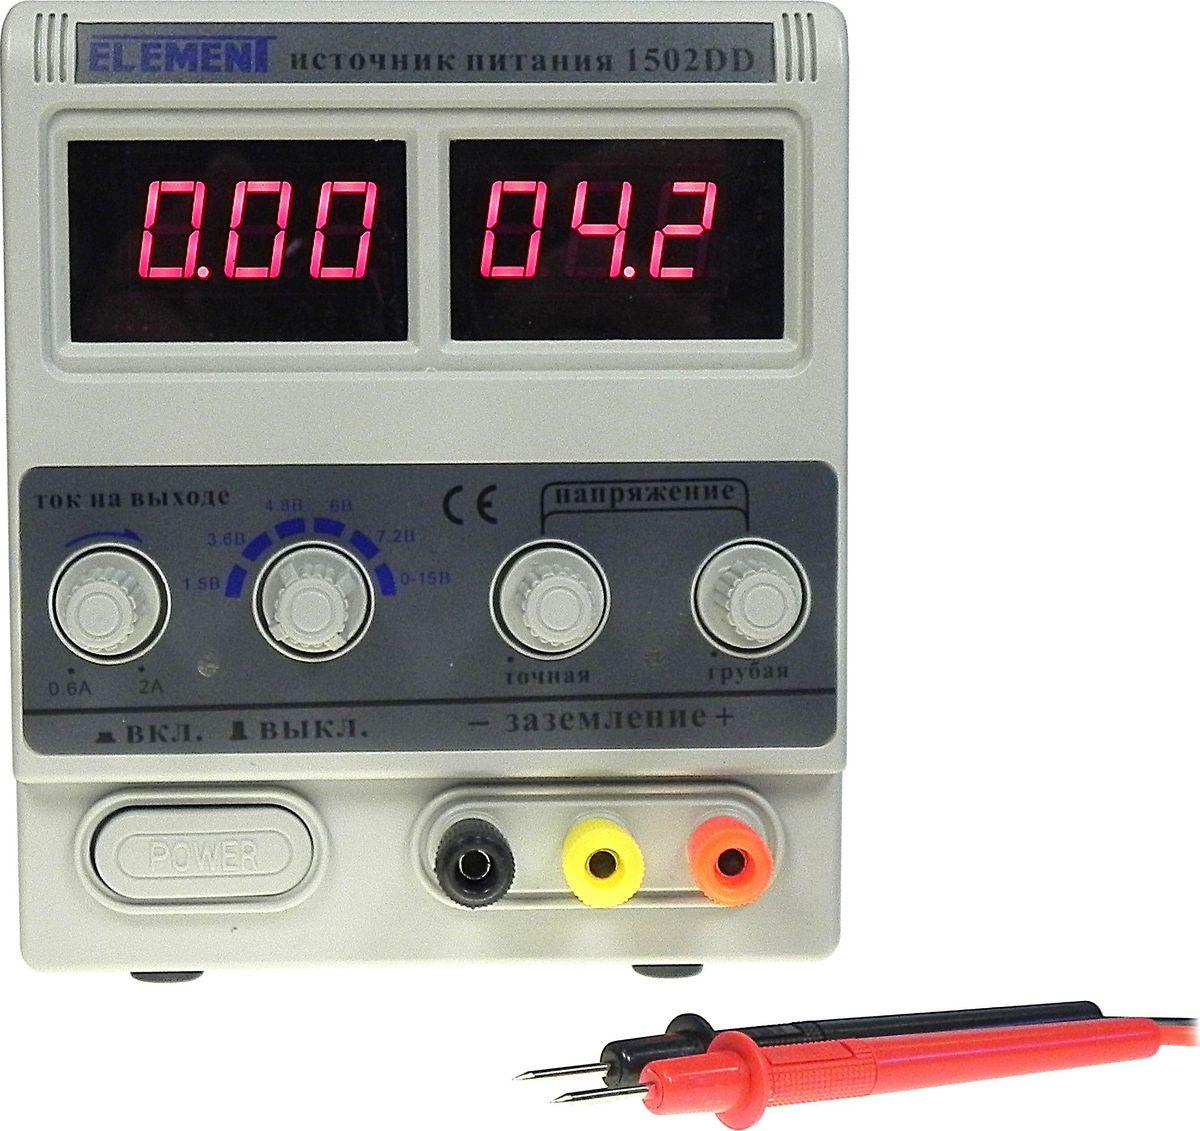 "Лабораторный блок питания Element ""1502DD"", 15V 2A"